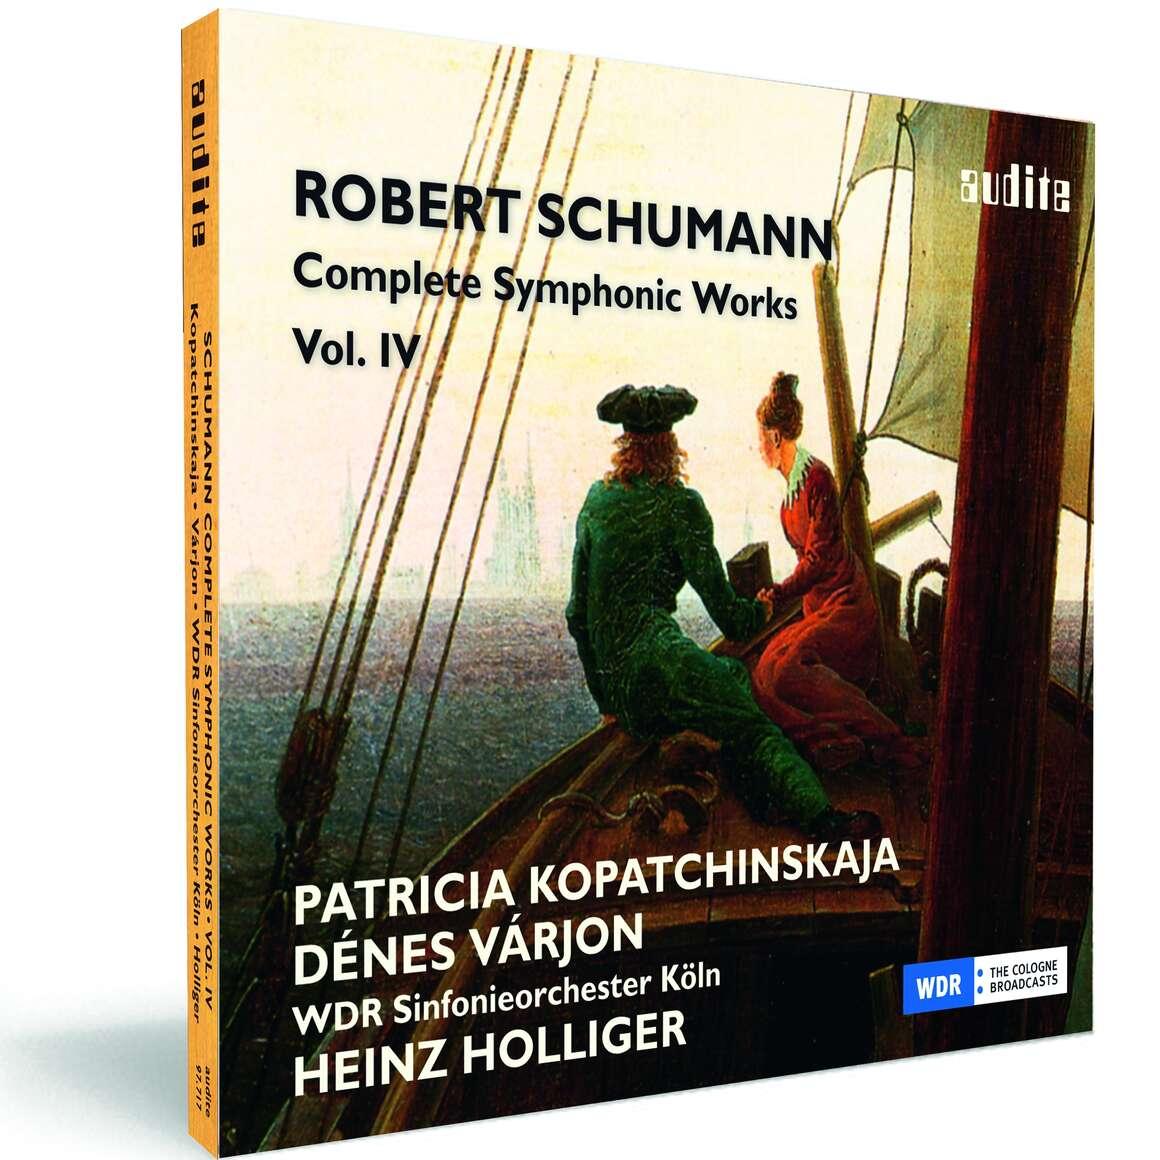 R. Schumann: Complete Symphonic Works, Vol. IV